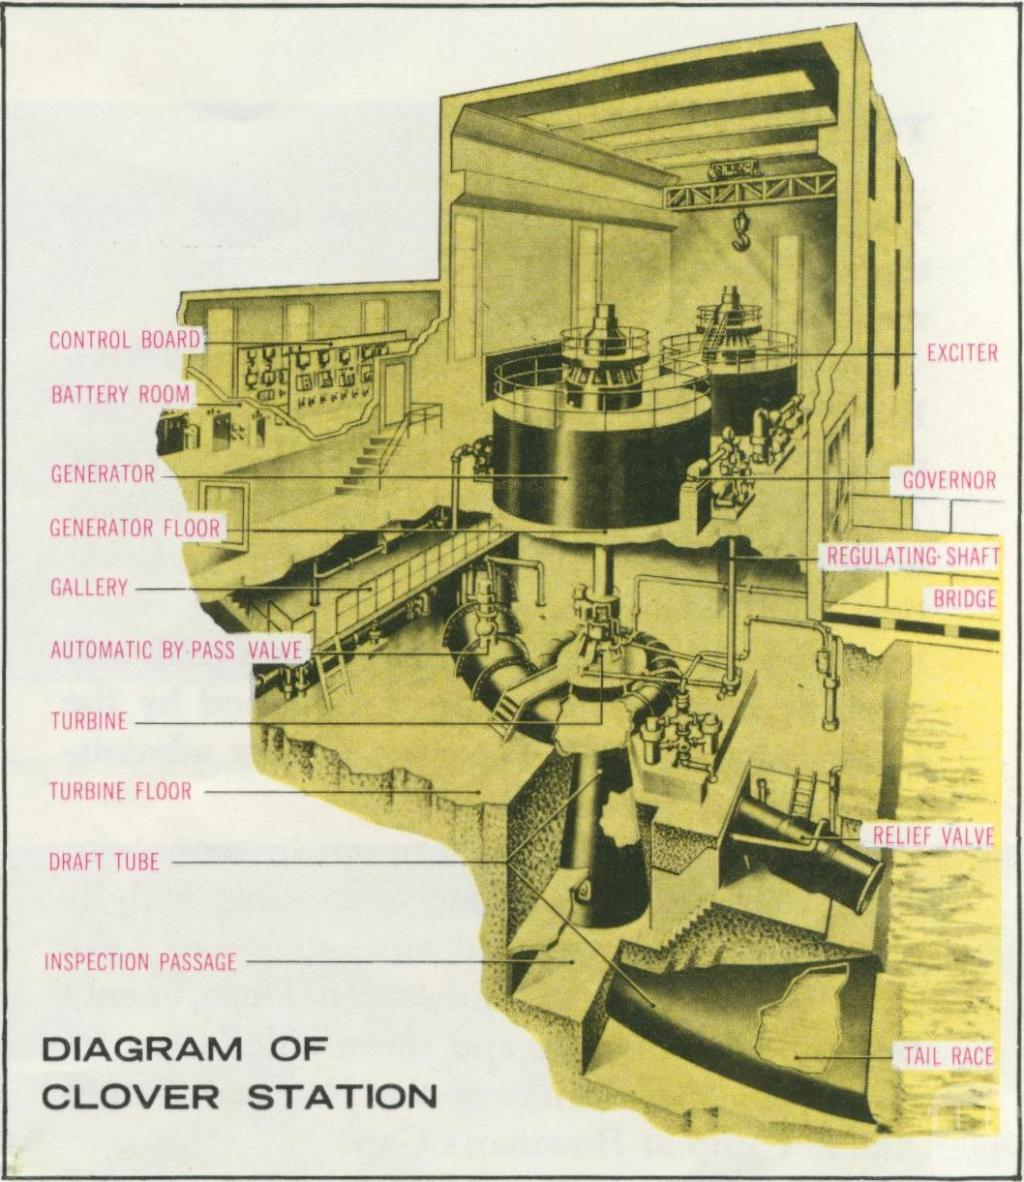 Diagram of Clover Station, Kiewa, 1971